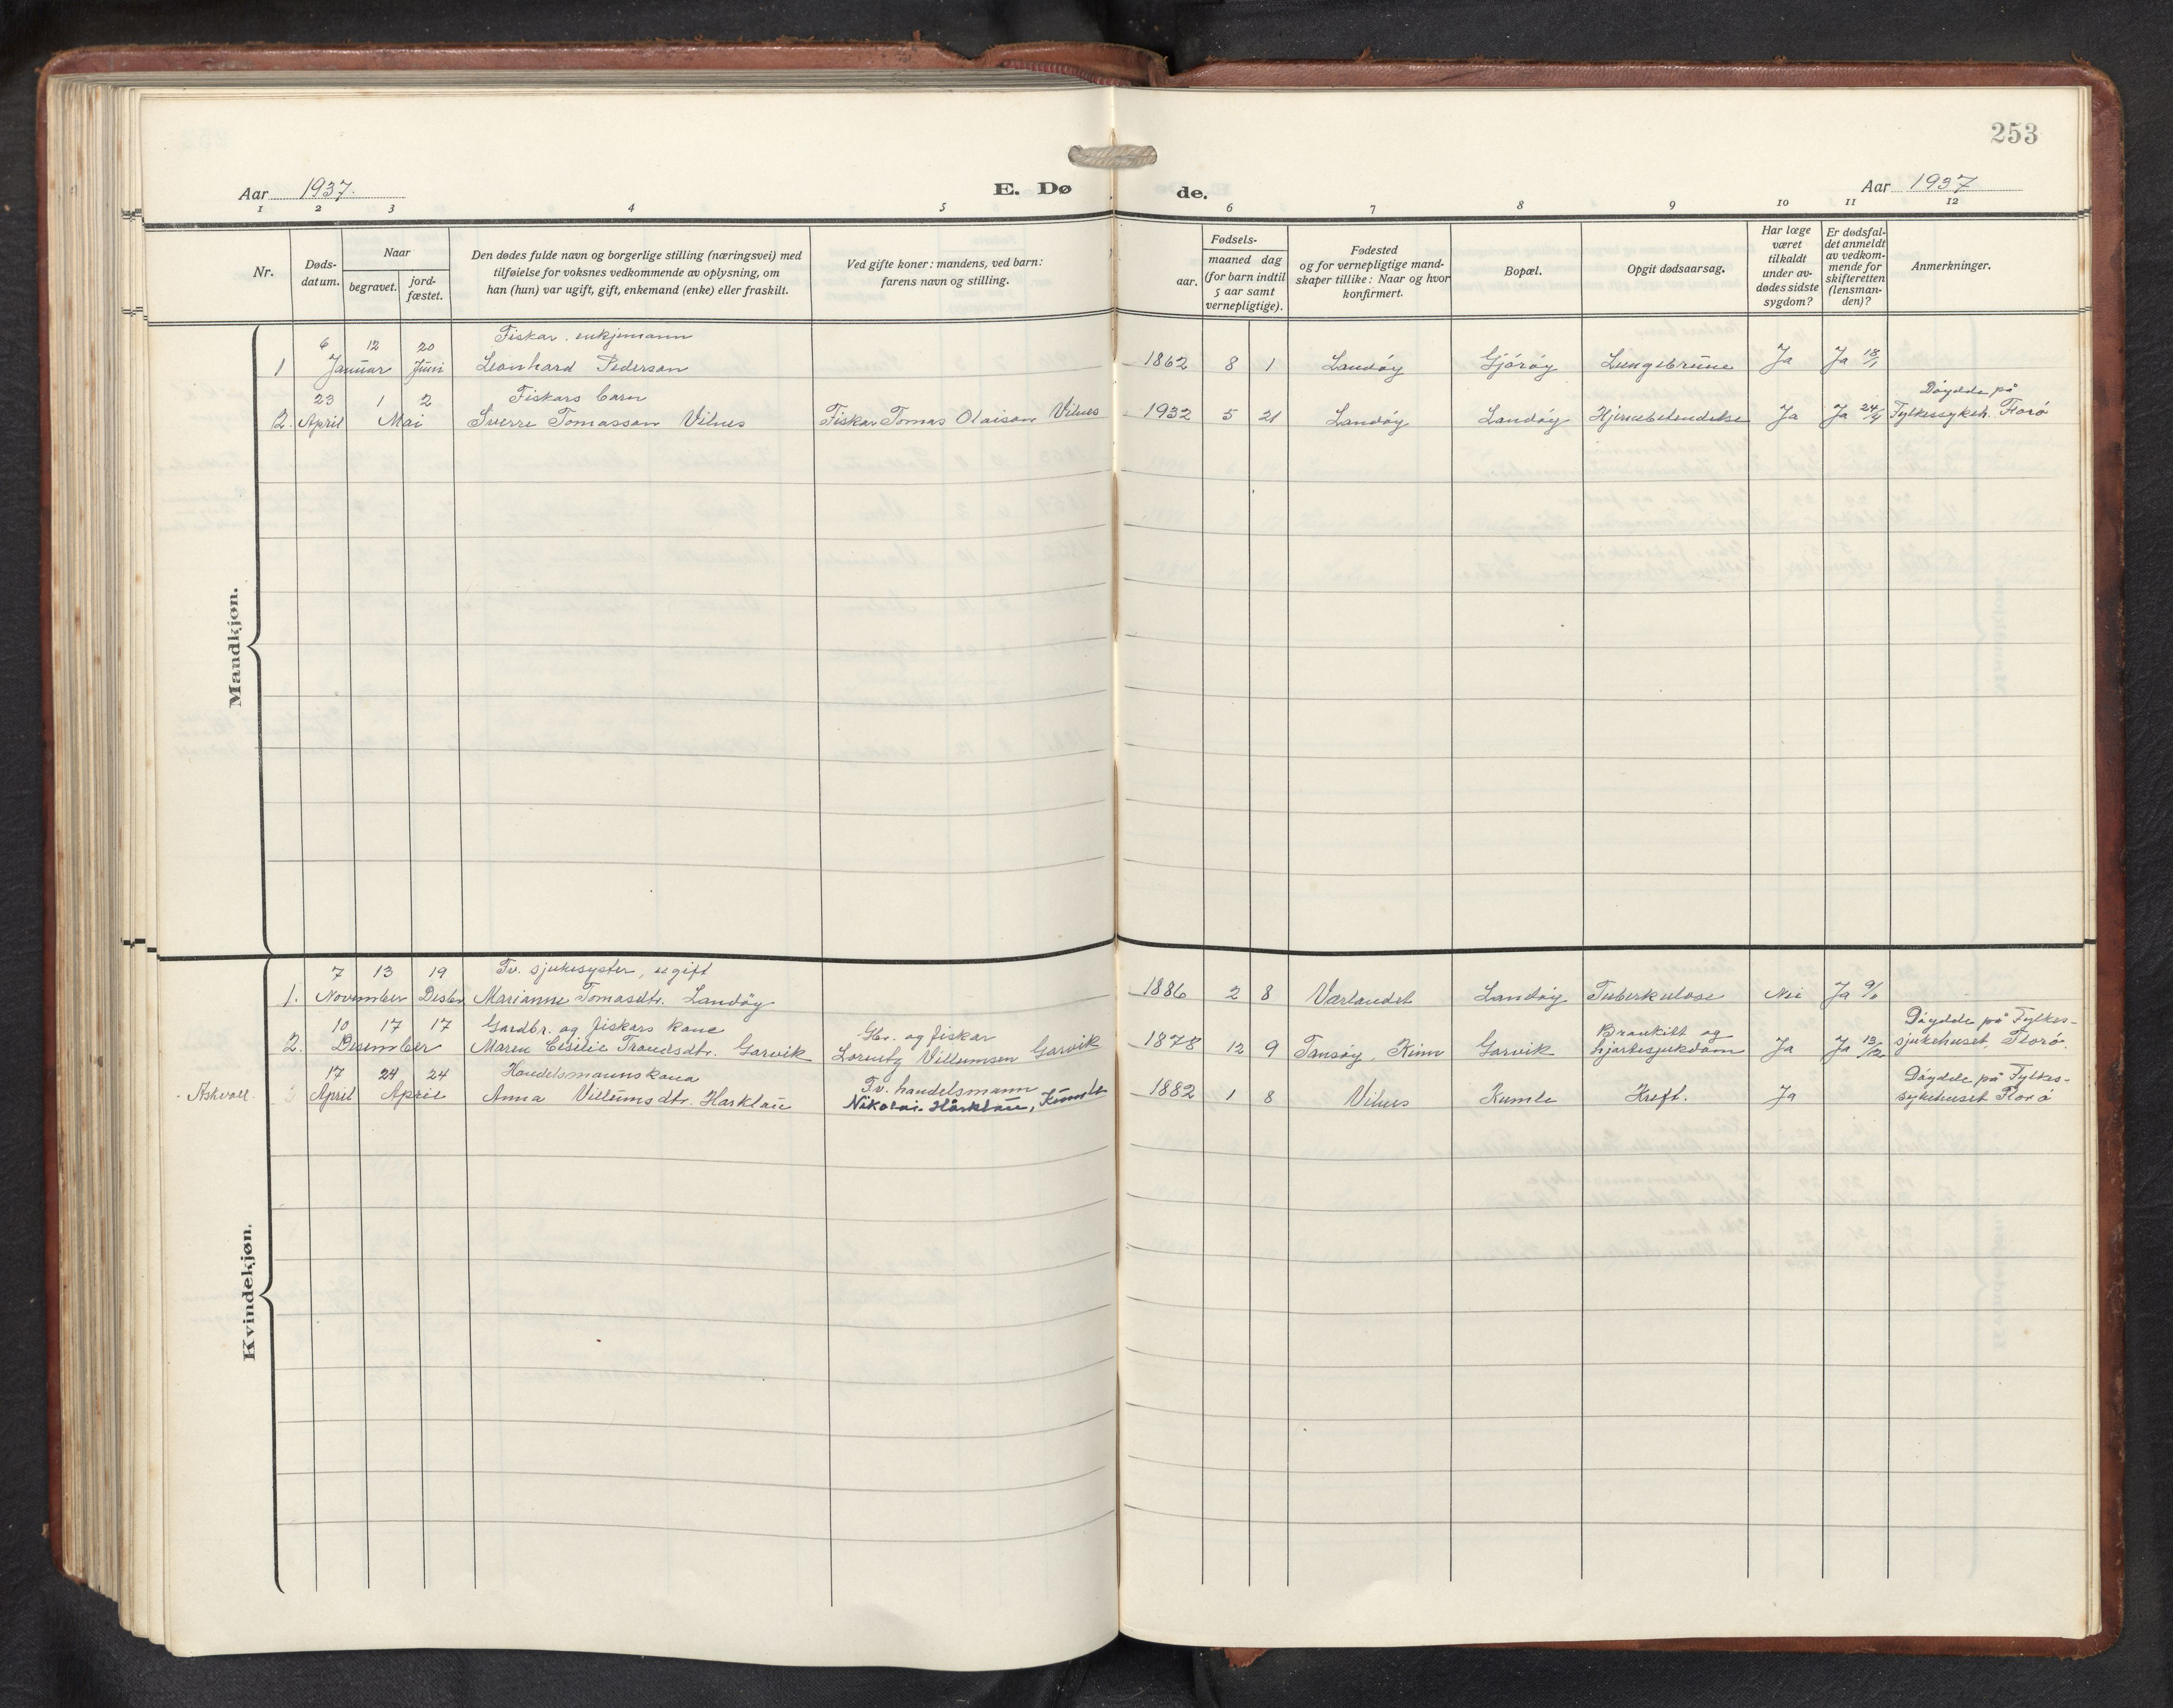 SAB, Askvoll sokneprestembete, H/Hab/Habb/L0002: Klokkerbok nr. B 2, 1910-1947, s. 252b-253a